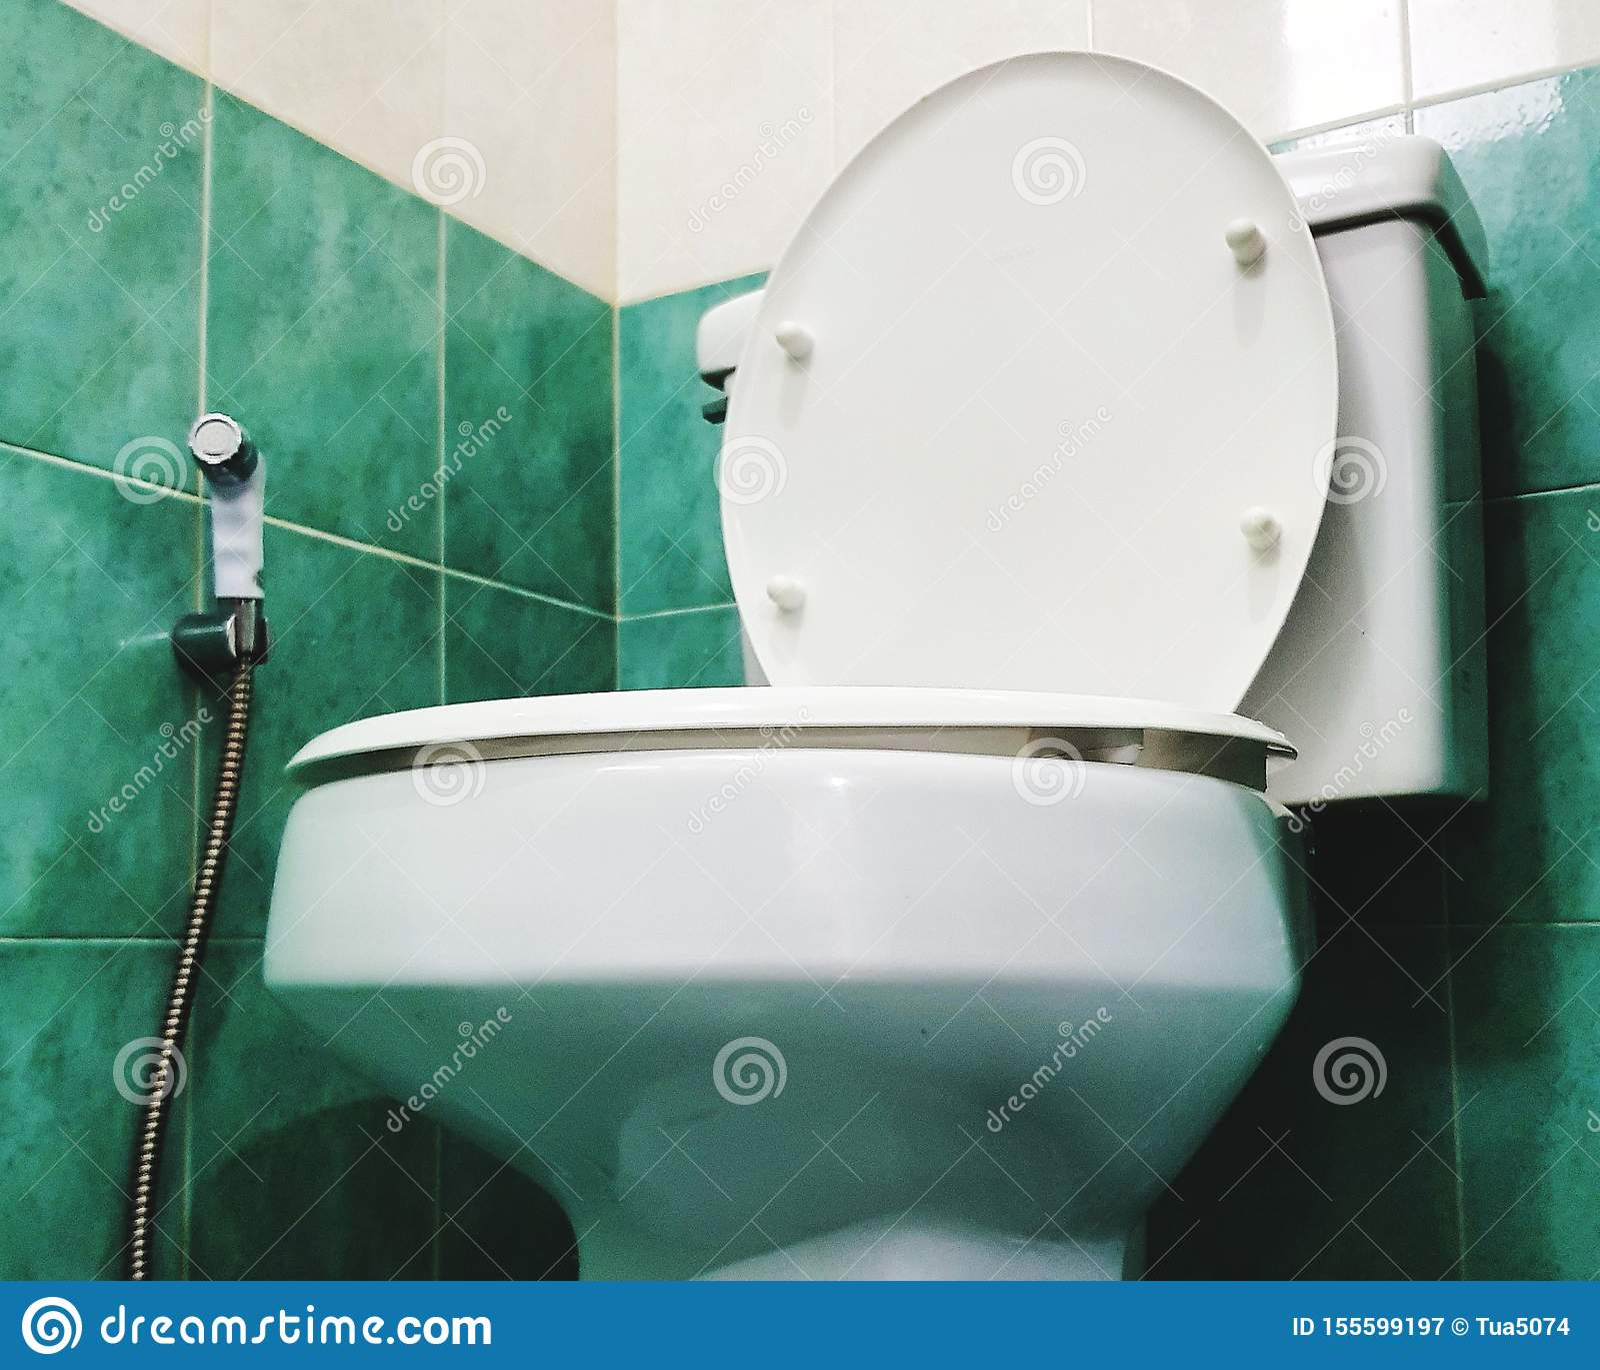 Flushing Toilet And Bidet Spray At Water Closet Stock Image